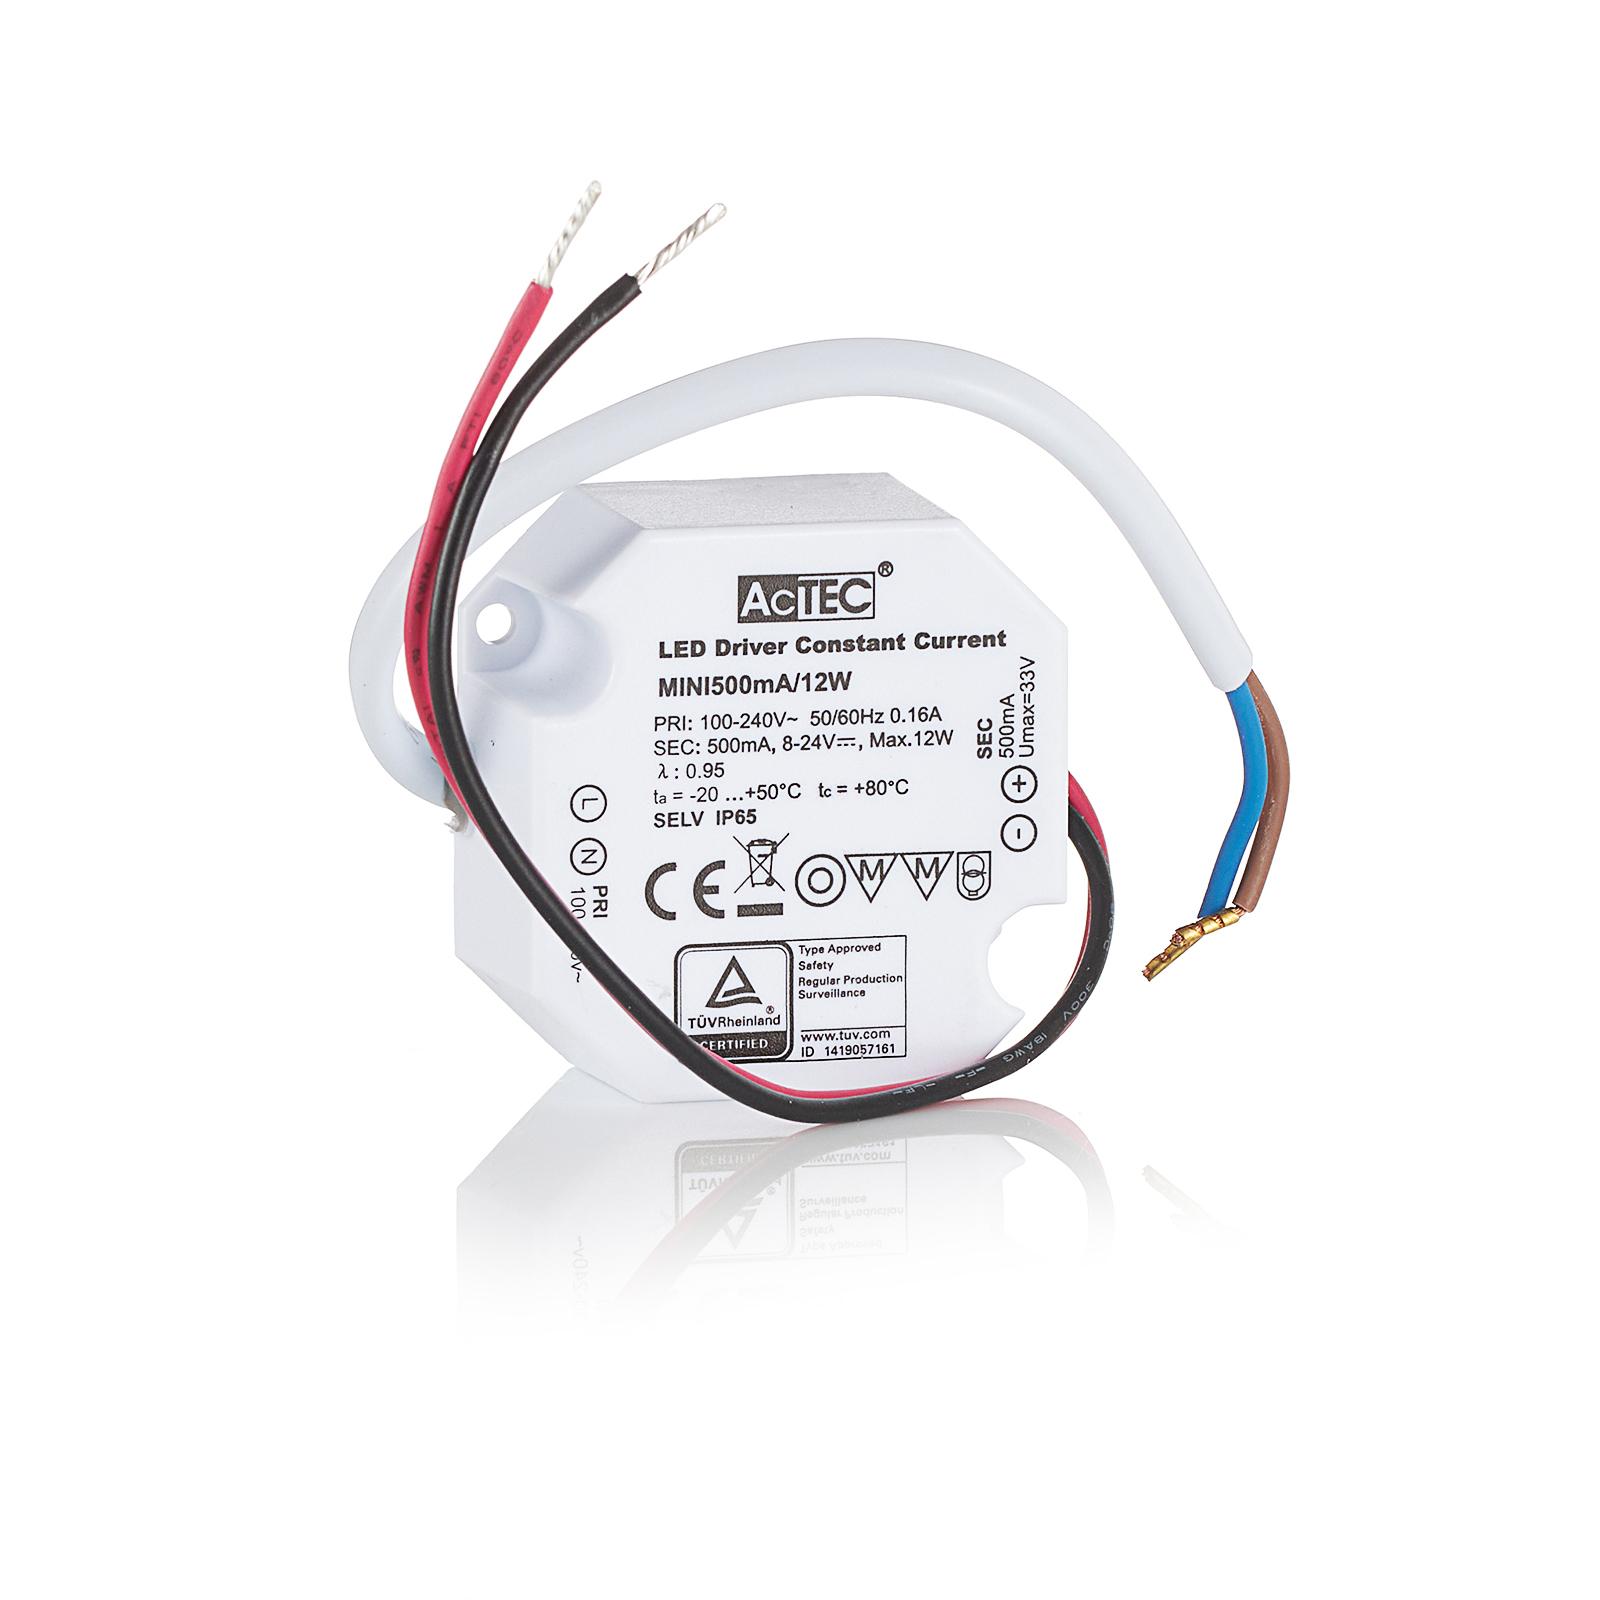 AcTEC Mini LED-driver CC 500 mA, 12 W, IP65